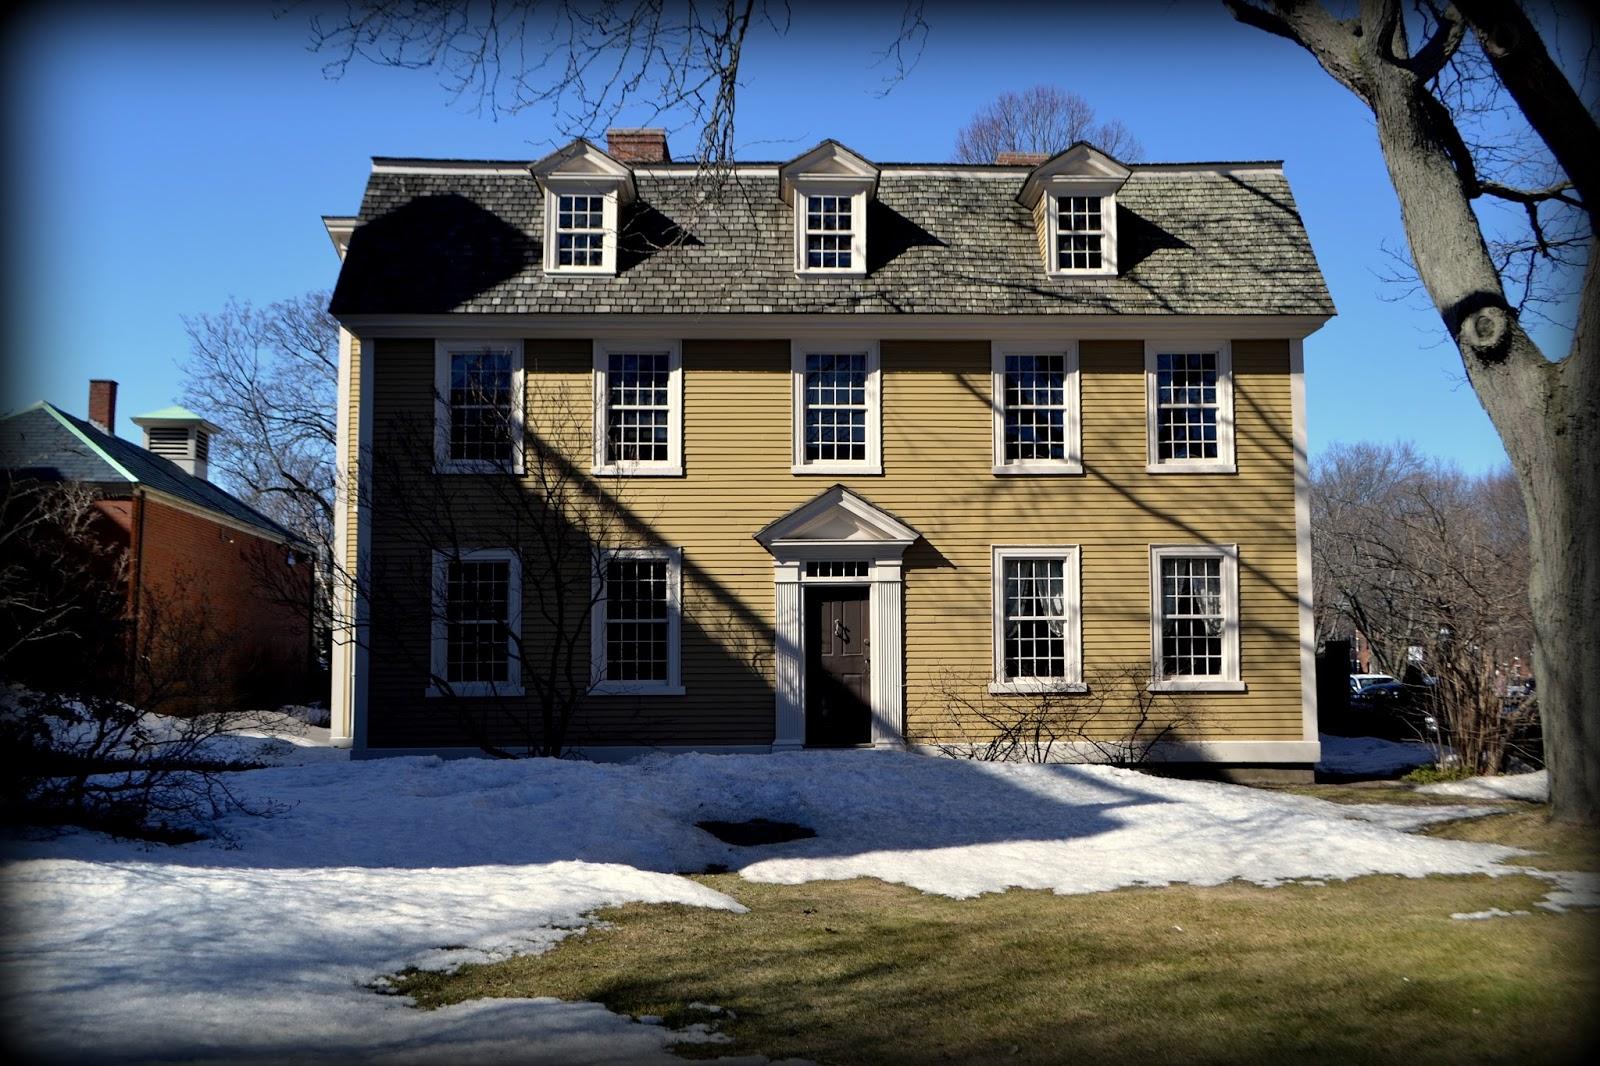 Crowinshield - Bentley House, Salem, MA